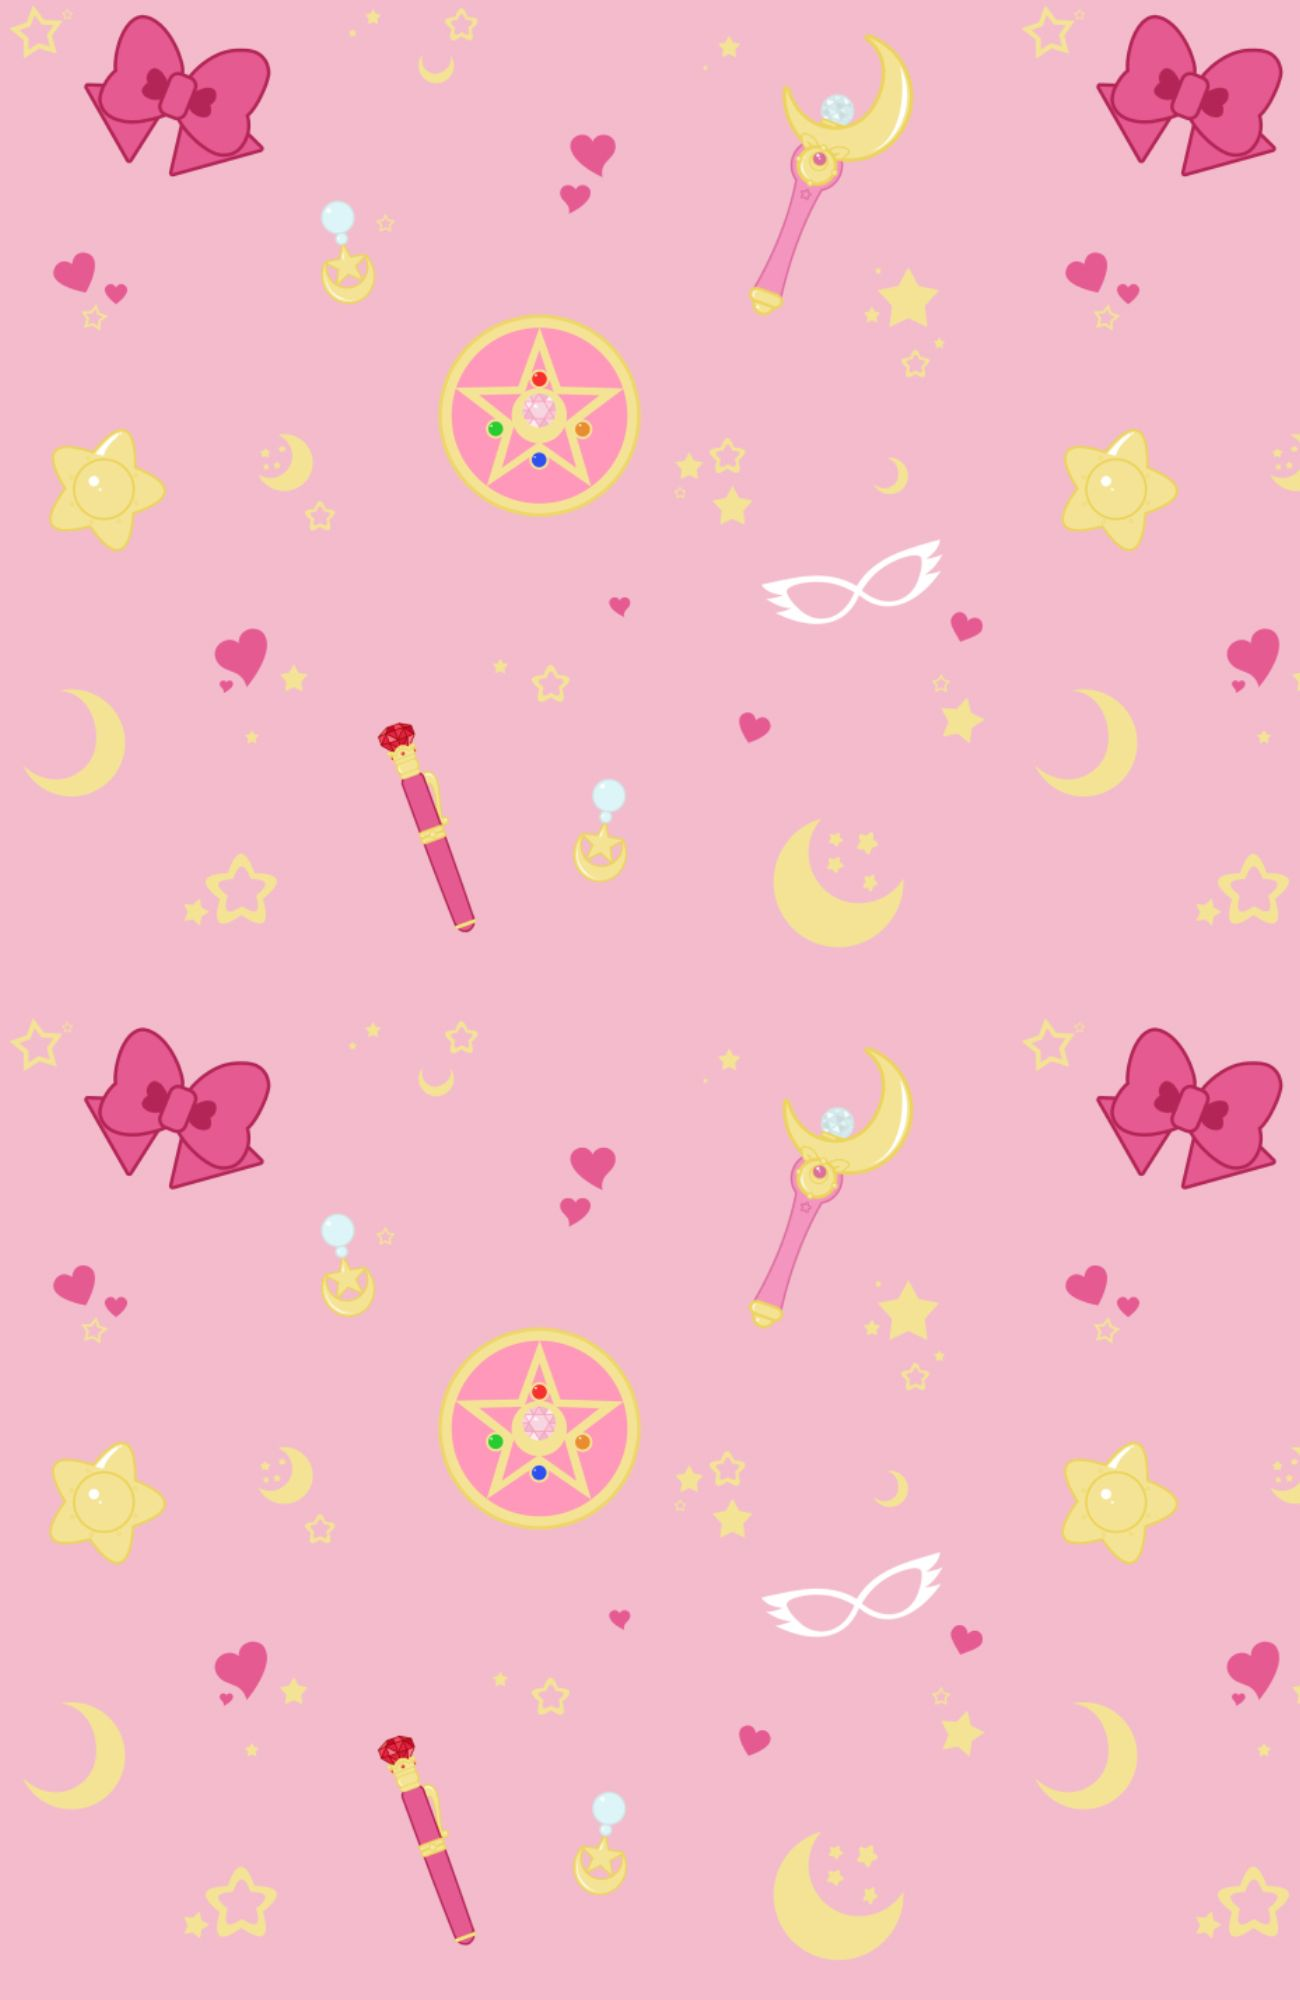 Sailor Moon Child セーラームーン 壁紙 セーラームーン Iphone